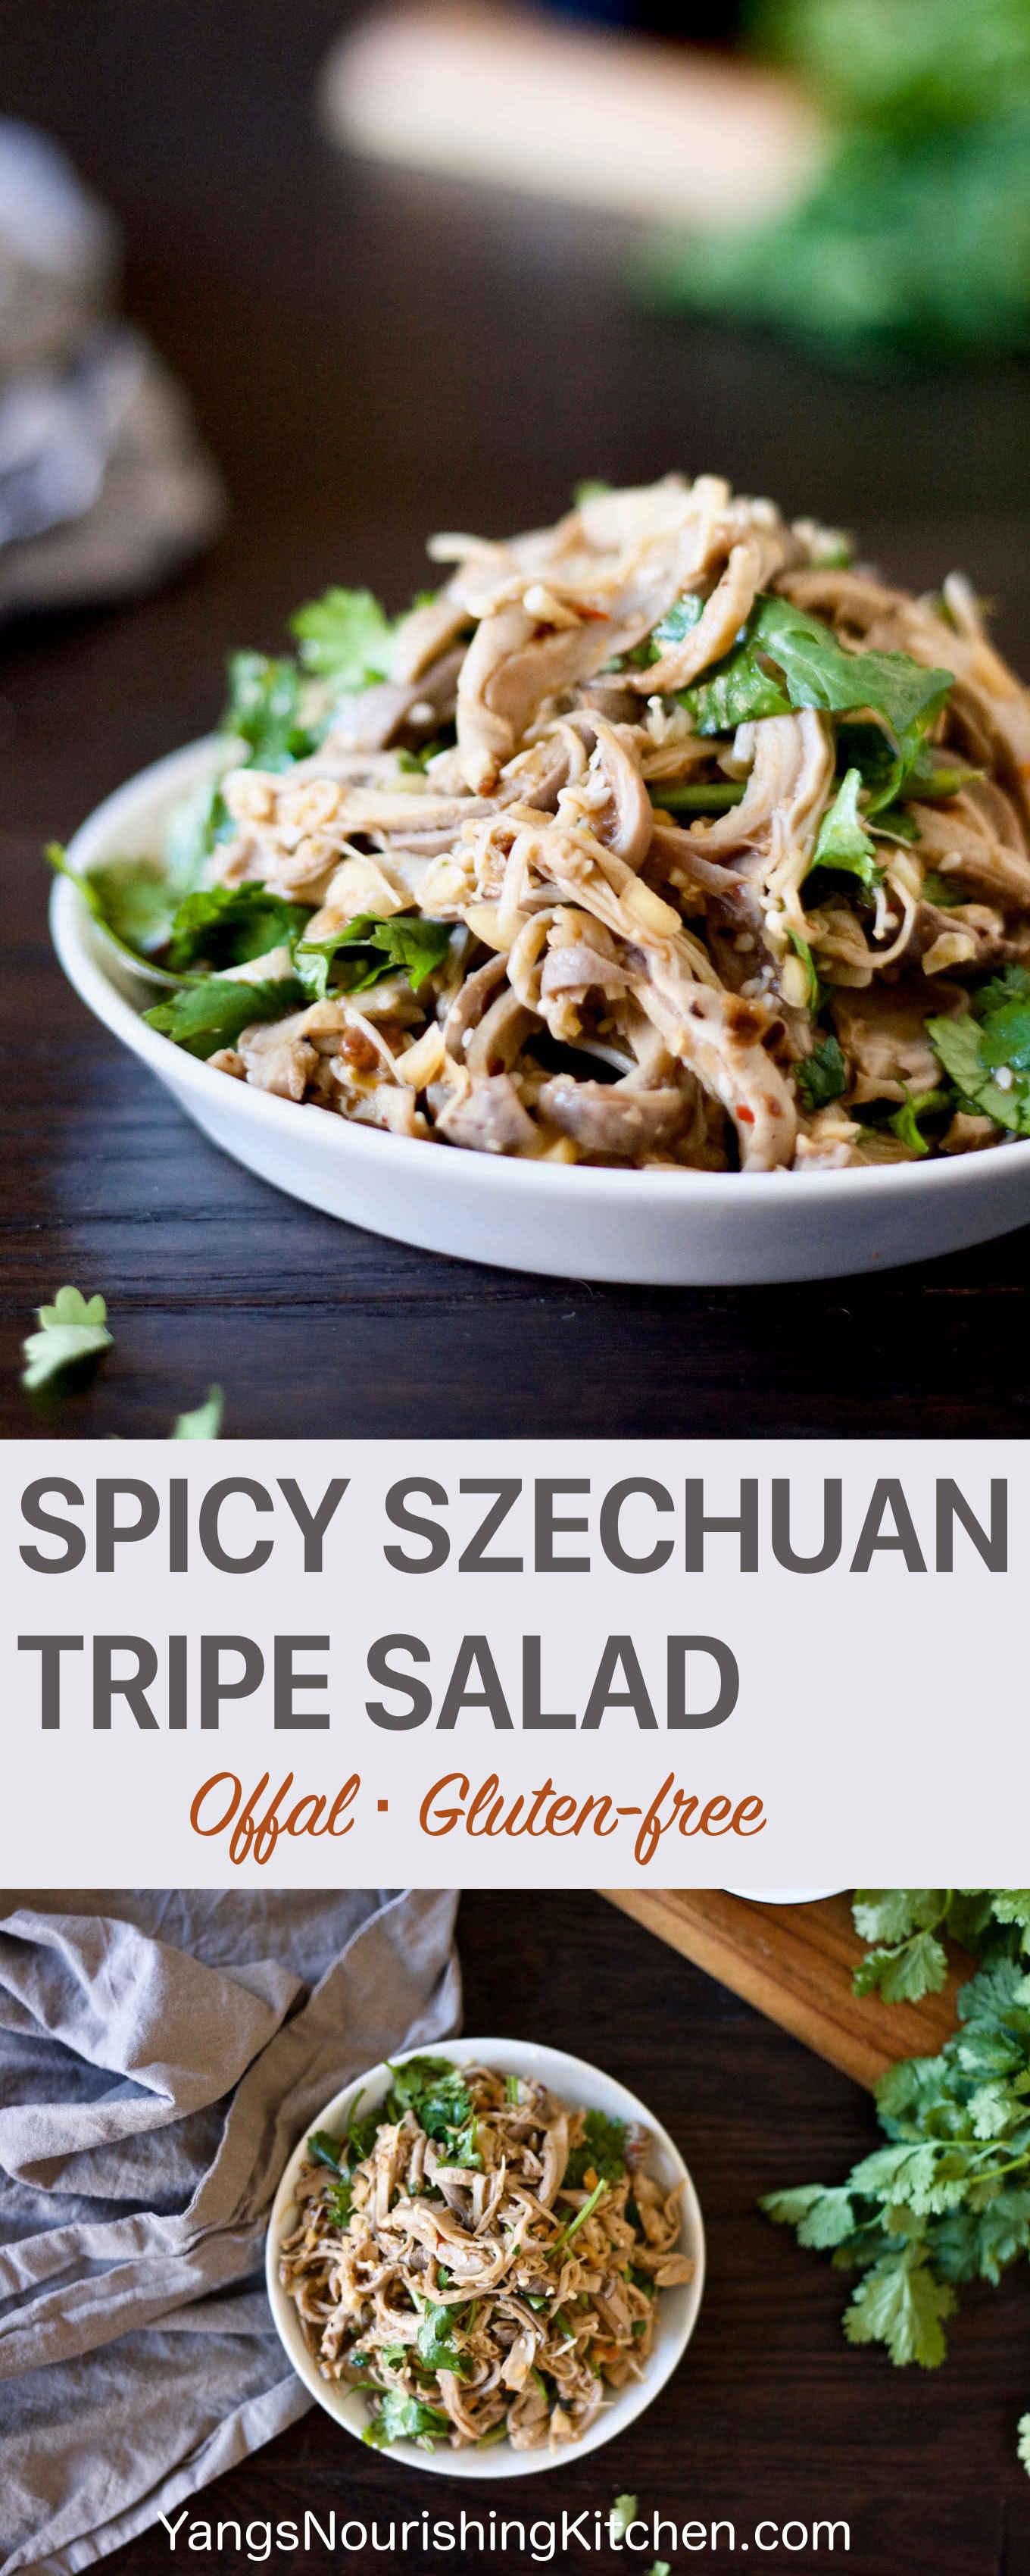 Spicy Szechuan Tripe Salad